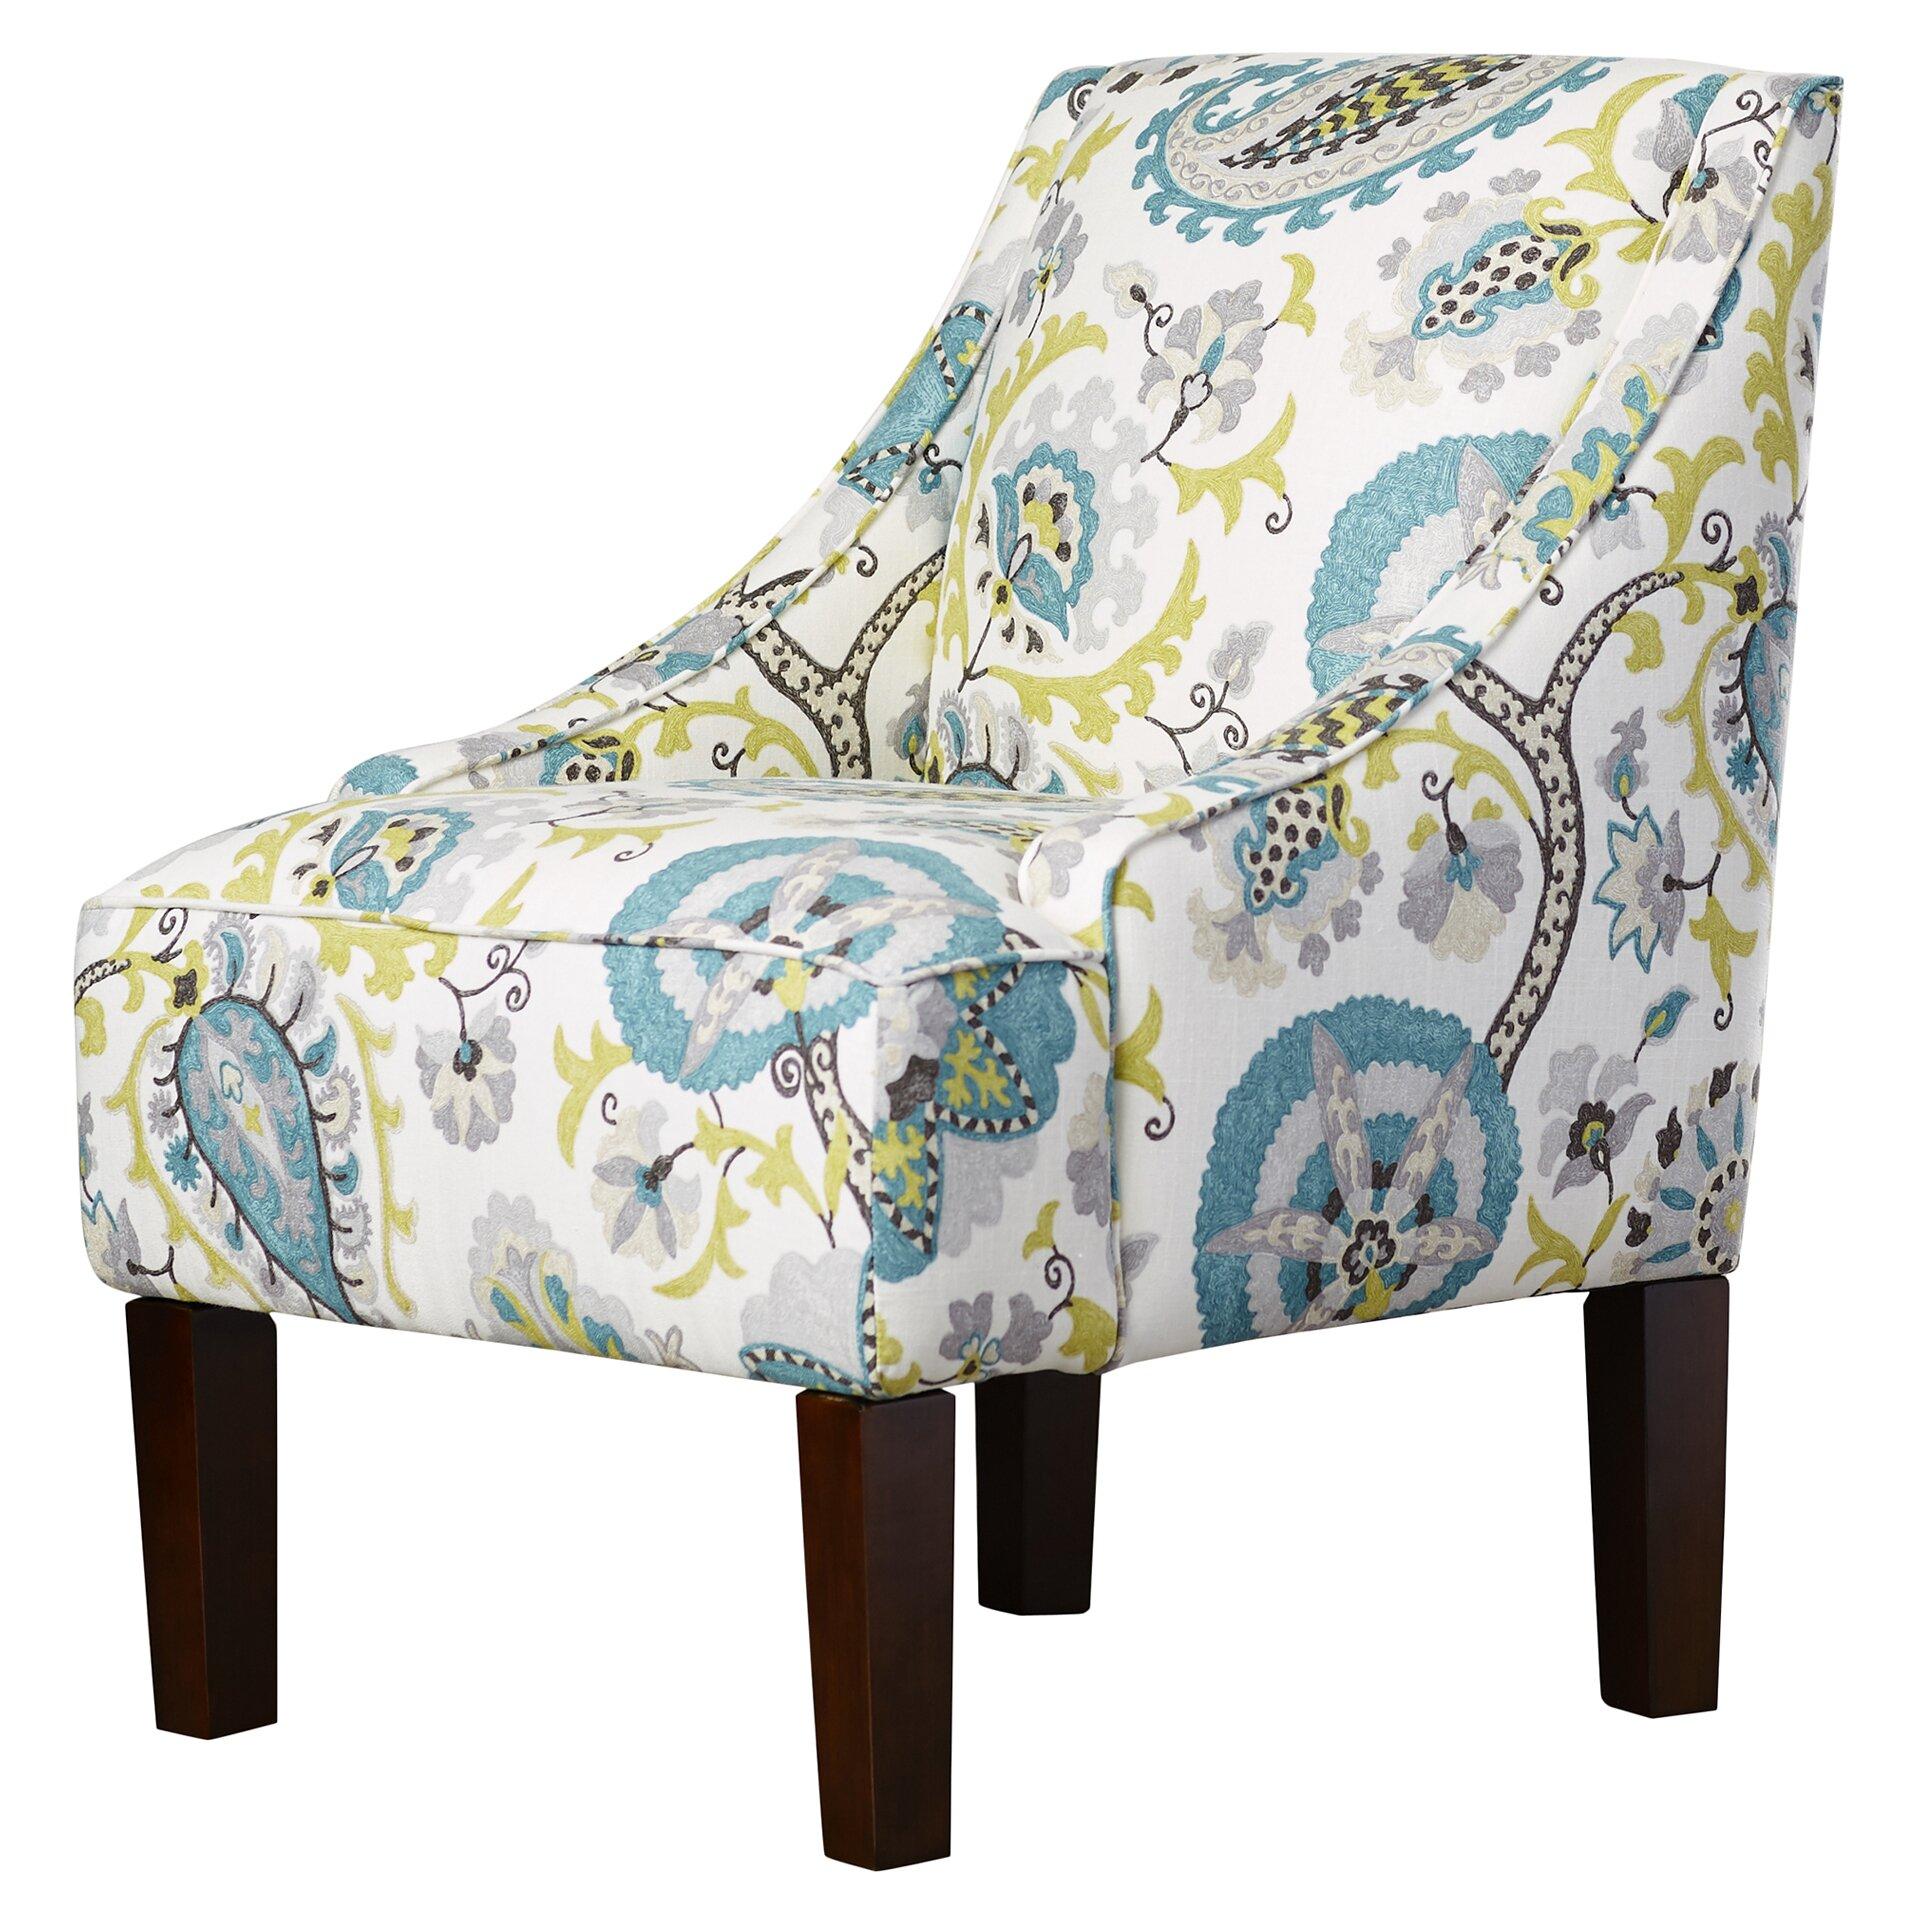 Bungalow Rose Heady Swoop Ladbroke Upholstered Arm Chair